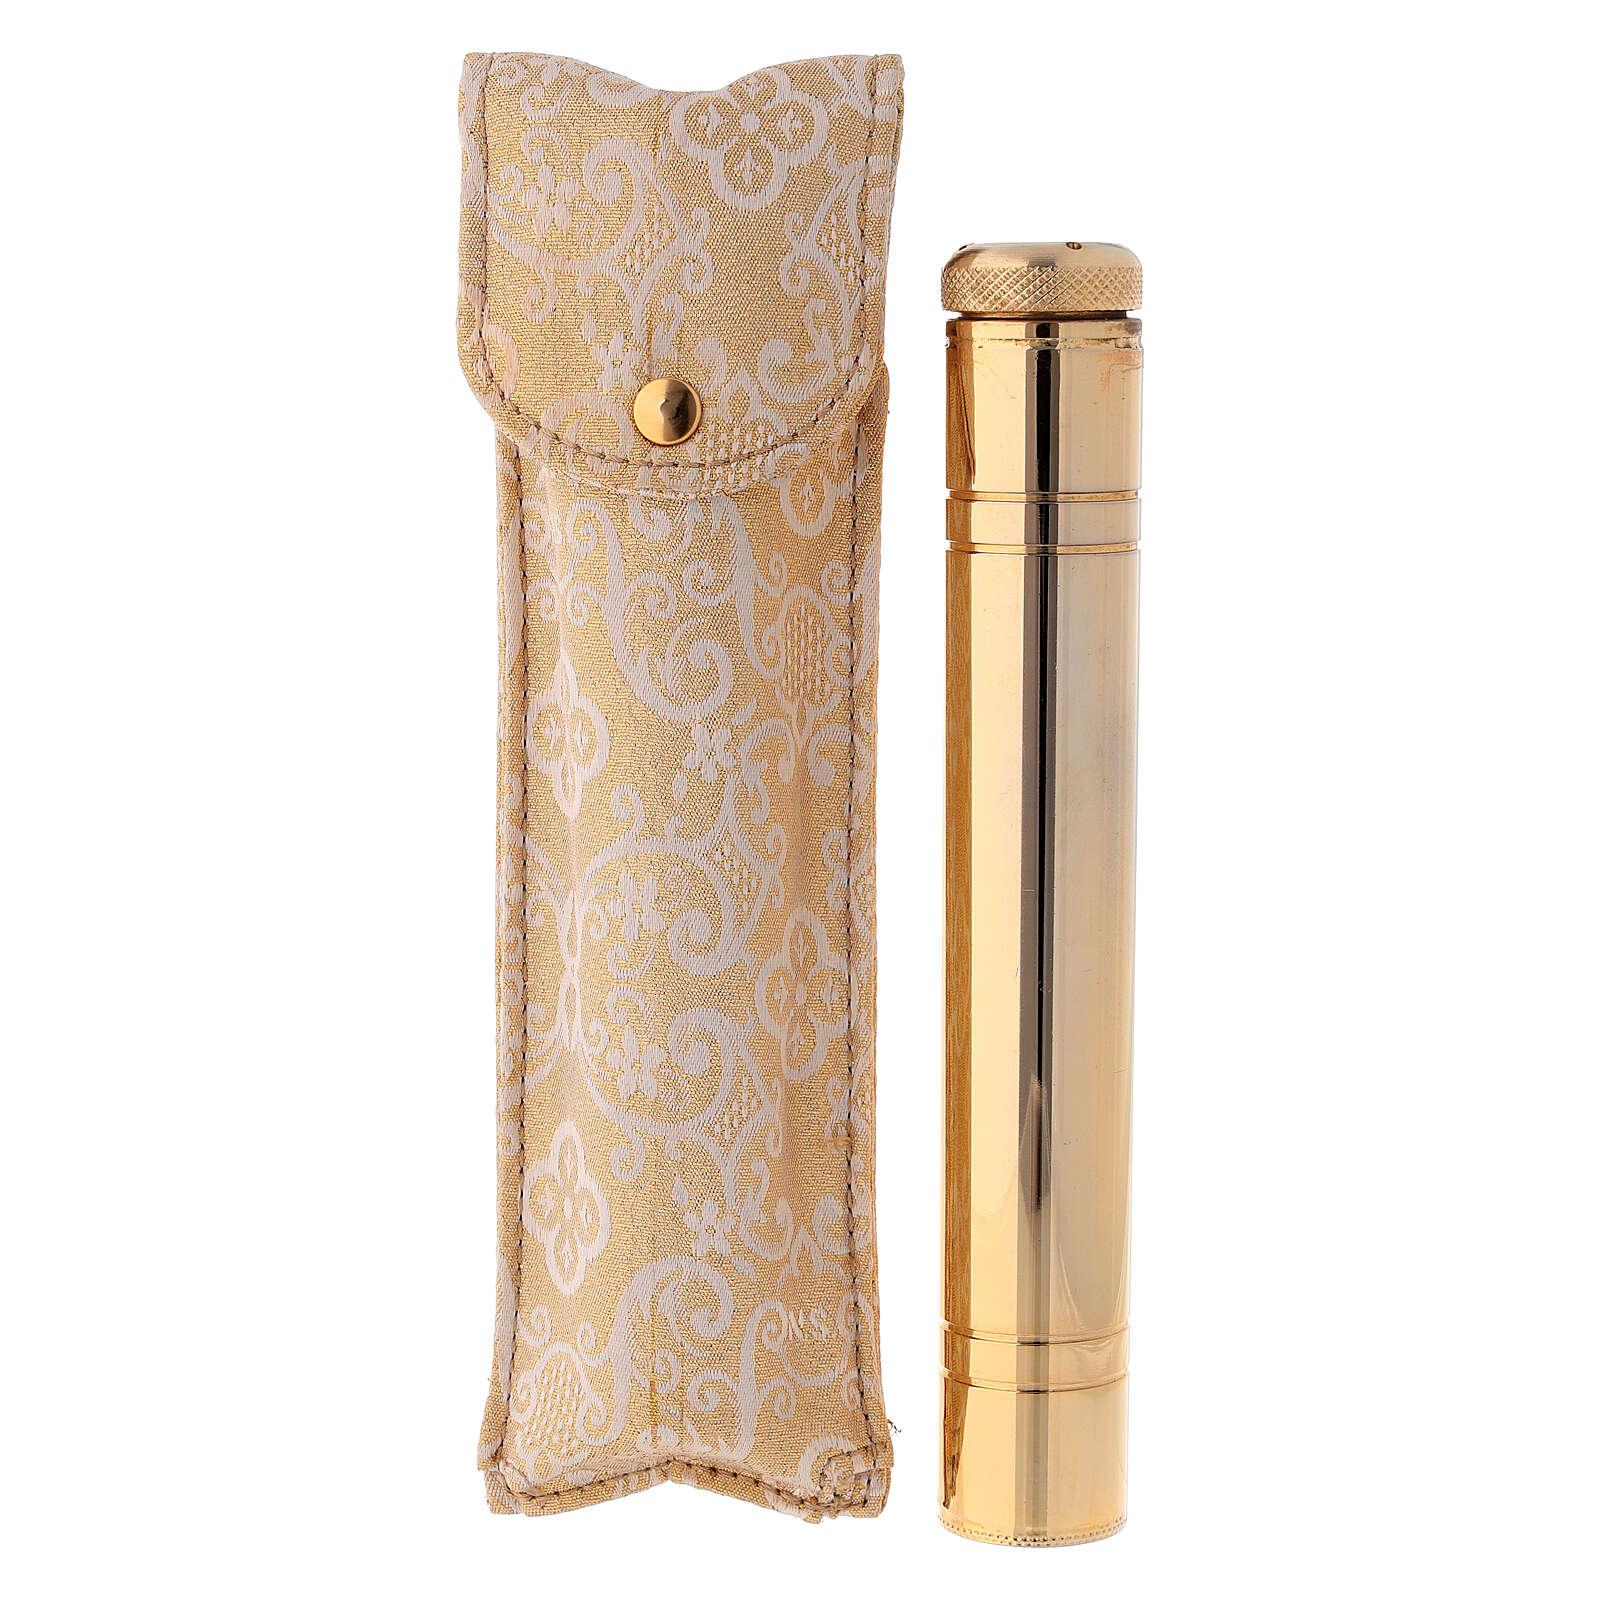 Hissope 16 cm dourado estojo jacquard oruo claro 3